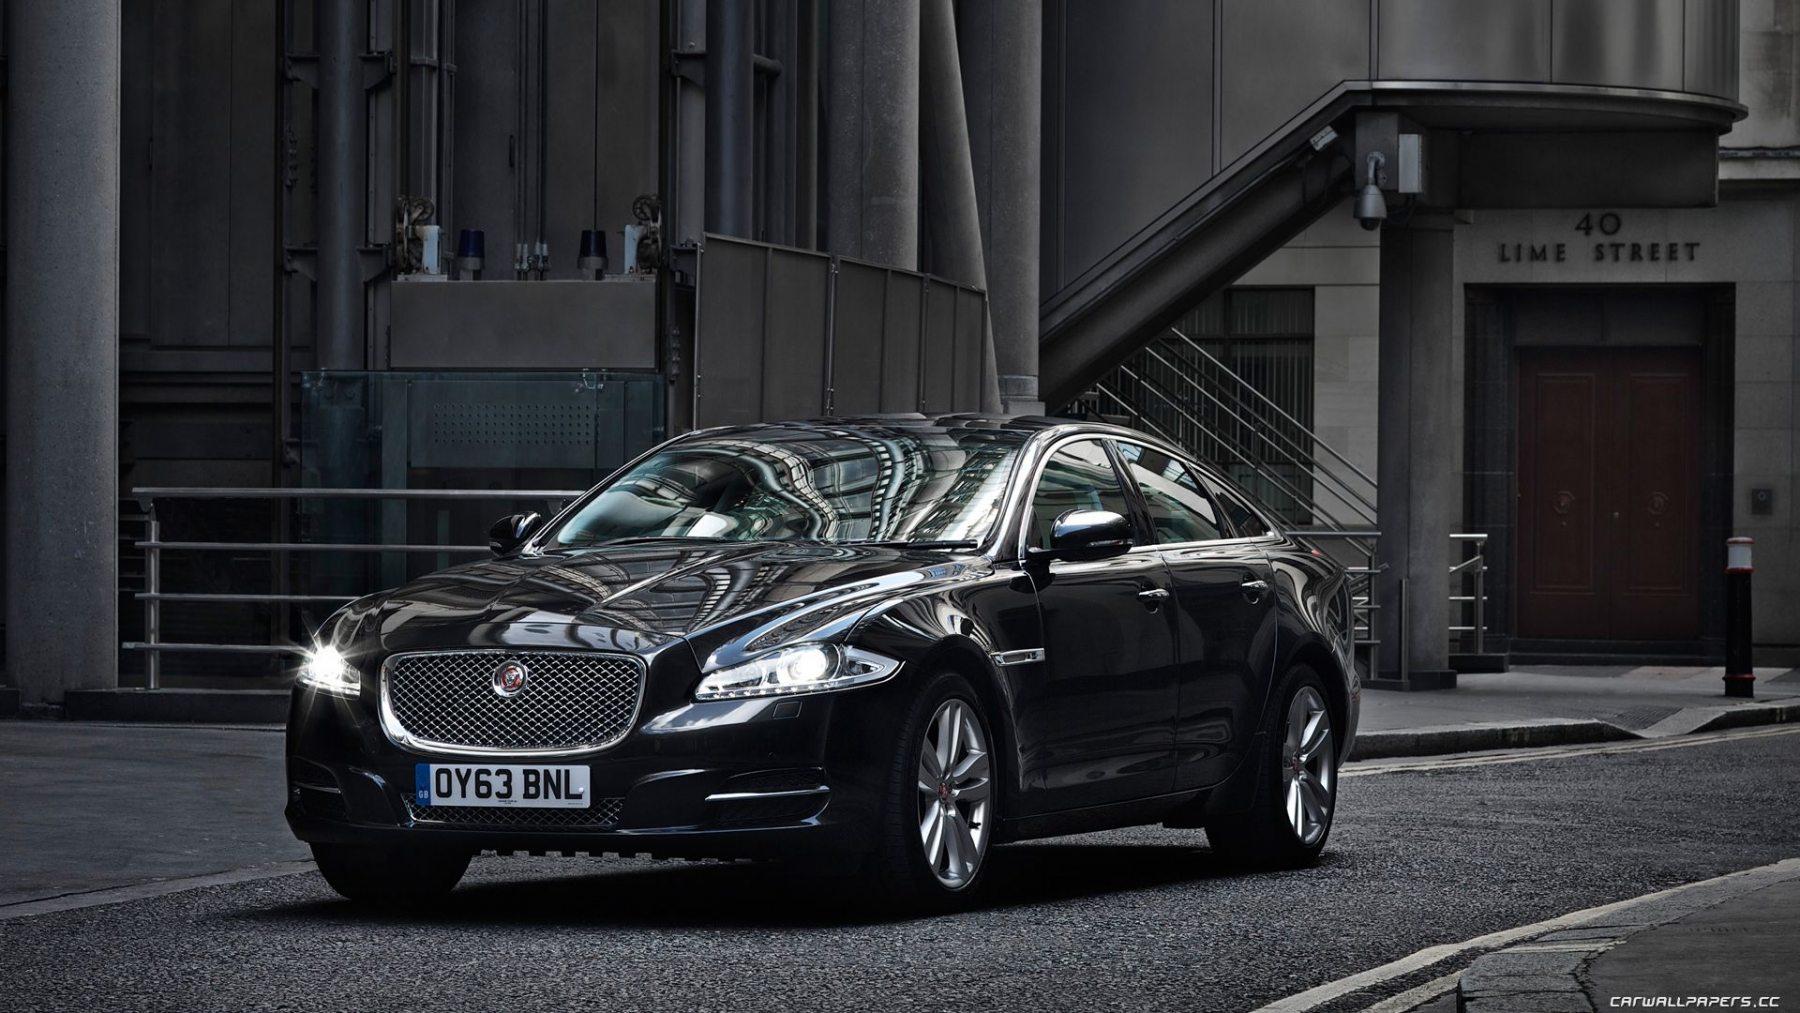 Jaguar Xf Wallpapers Yl Computing